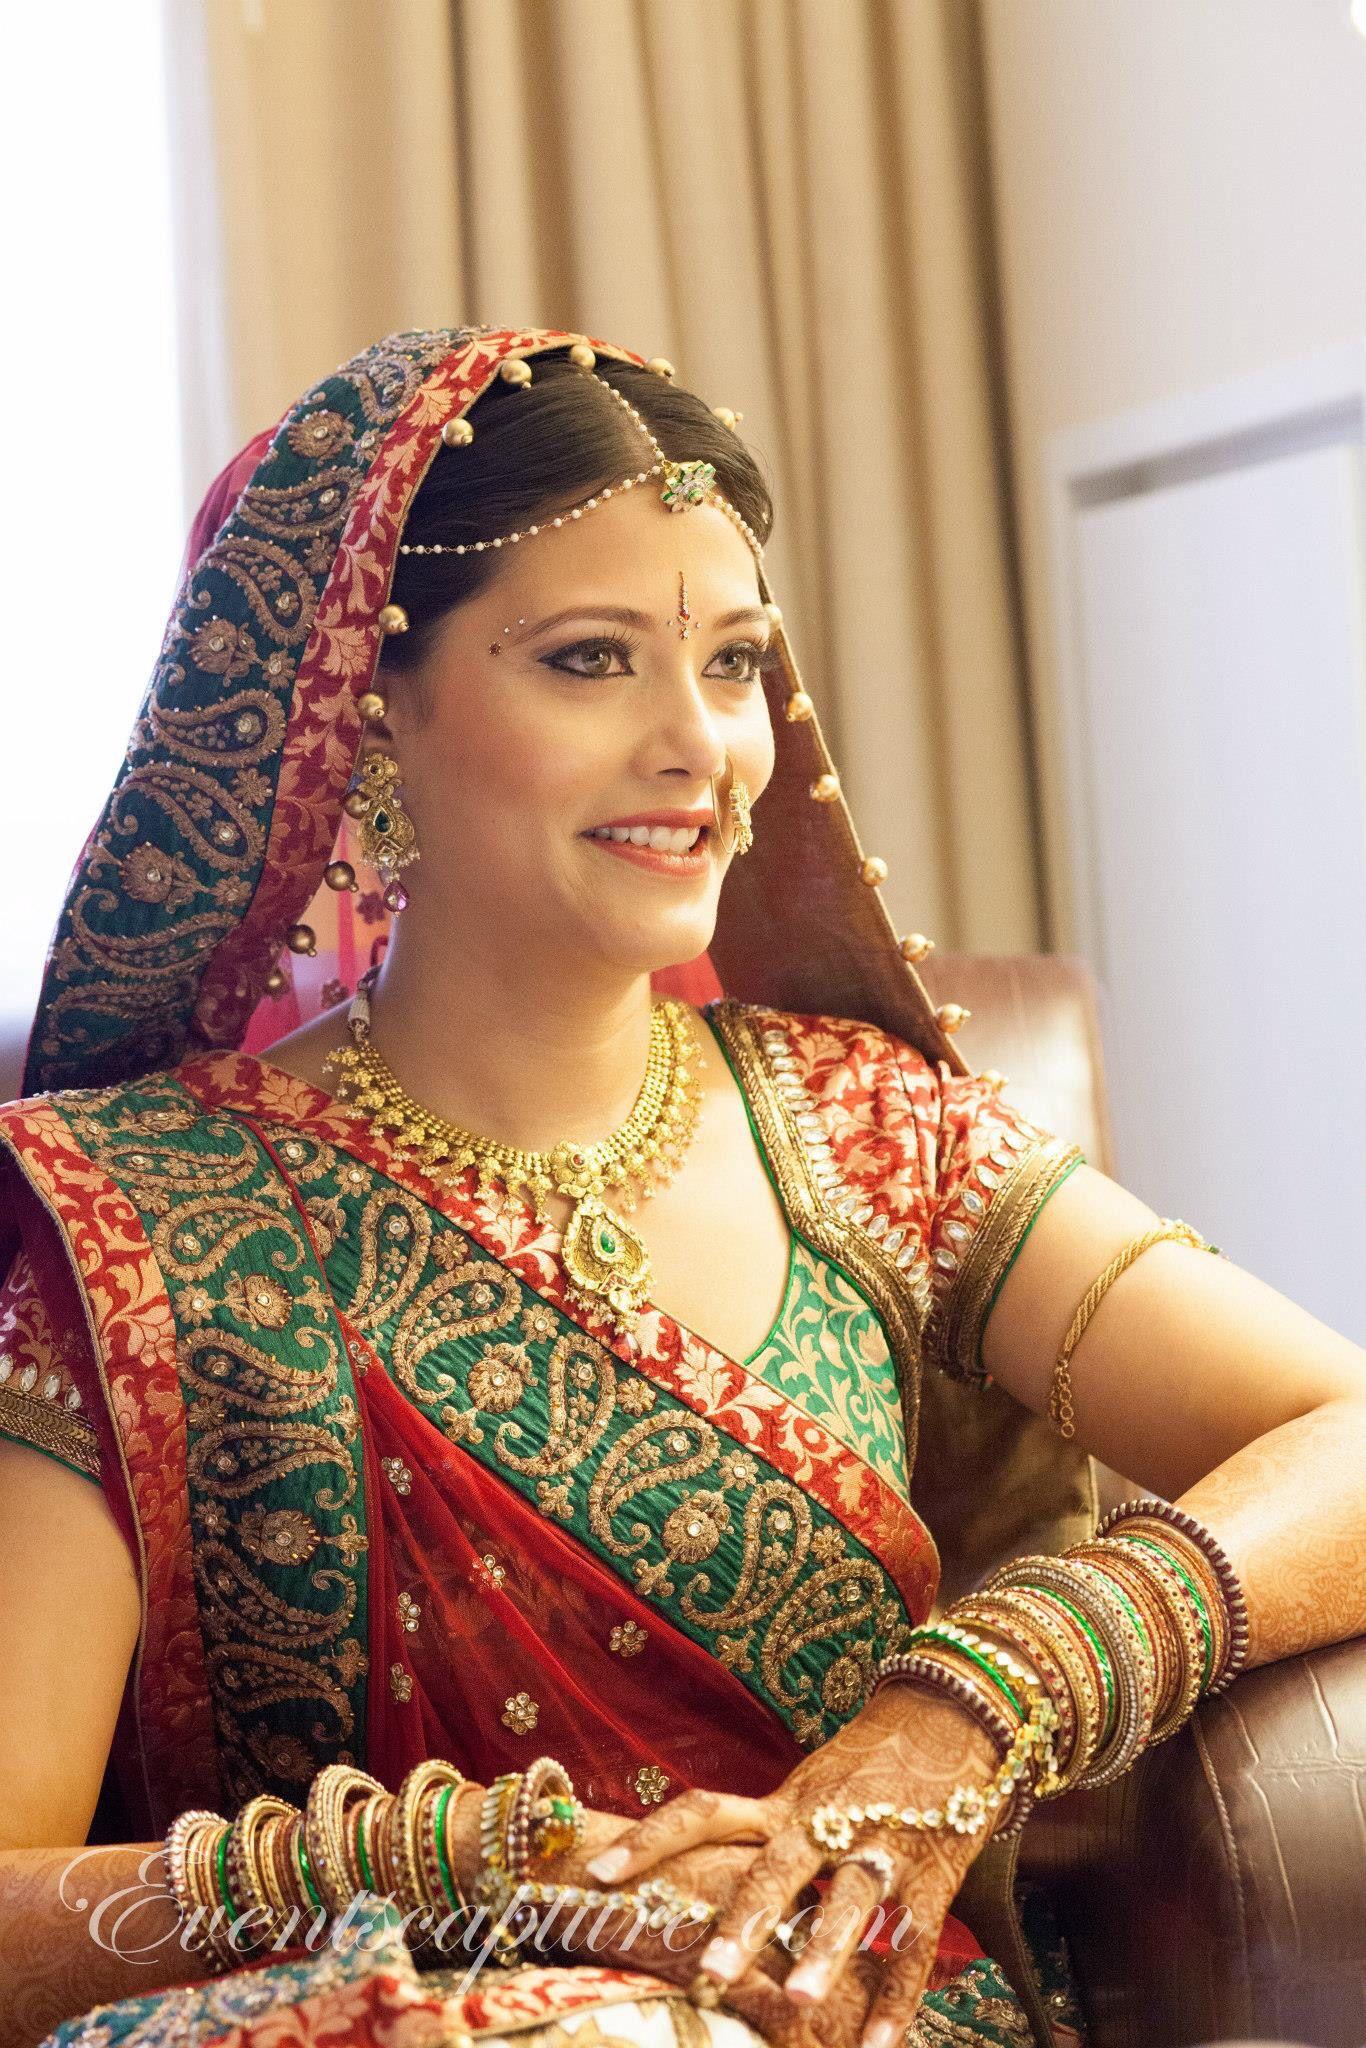 Soft Looks For Gujarati Bride Looks By Jassi Indian Bridal Outfits Indian Bridal Bridal Outfits